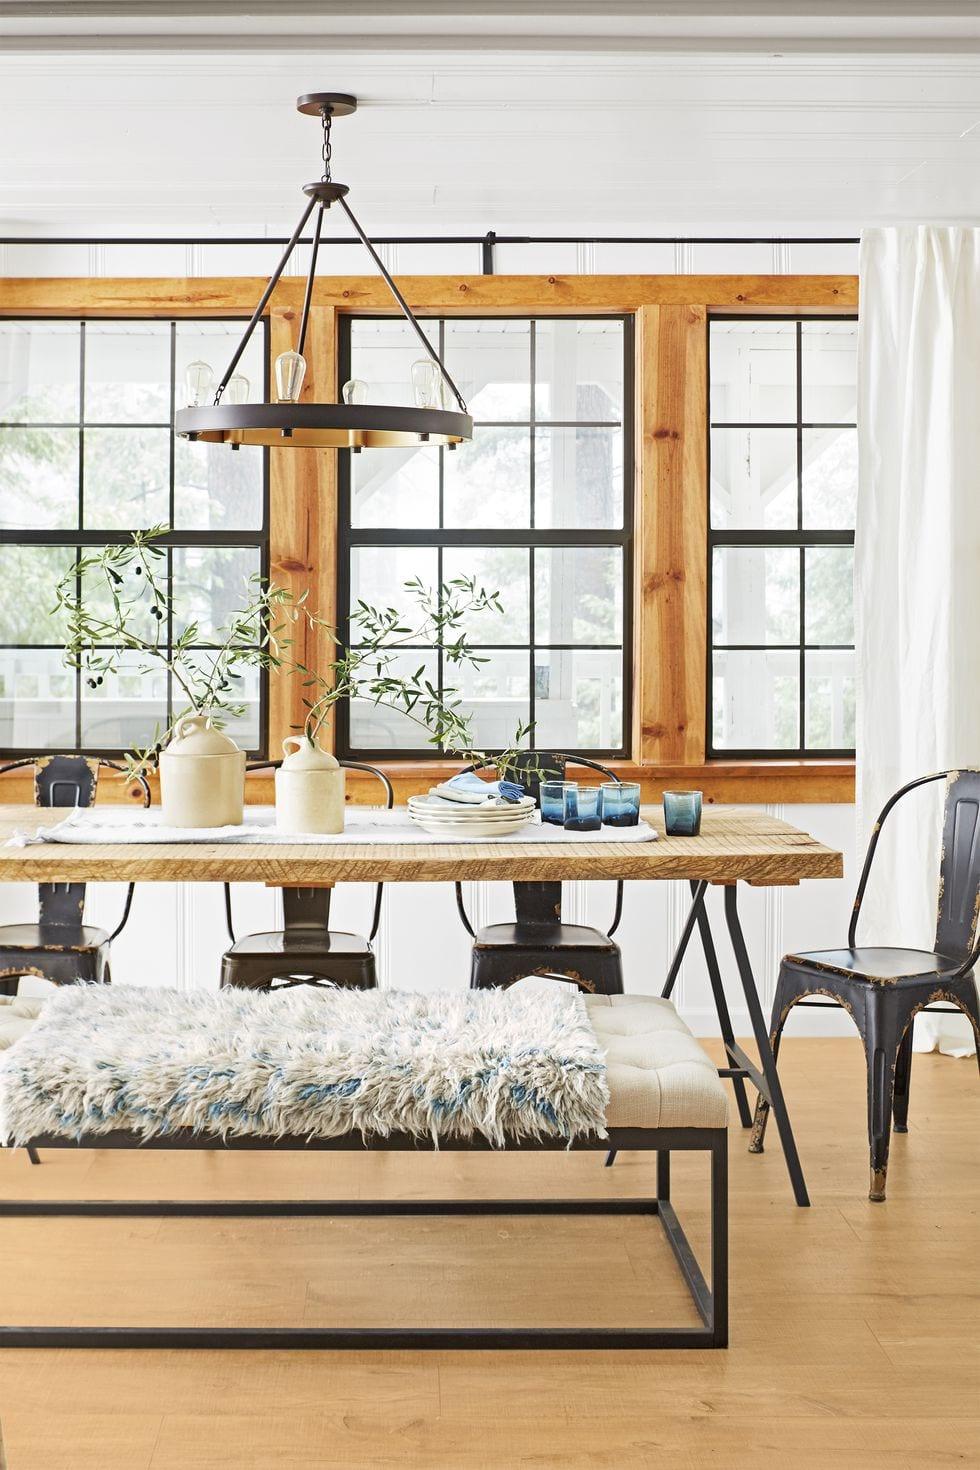 DIY Dining Table design ideas